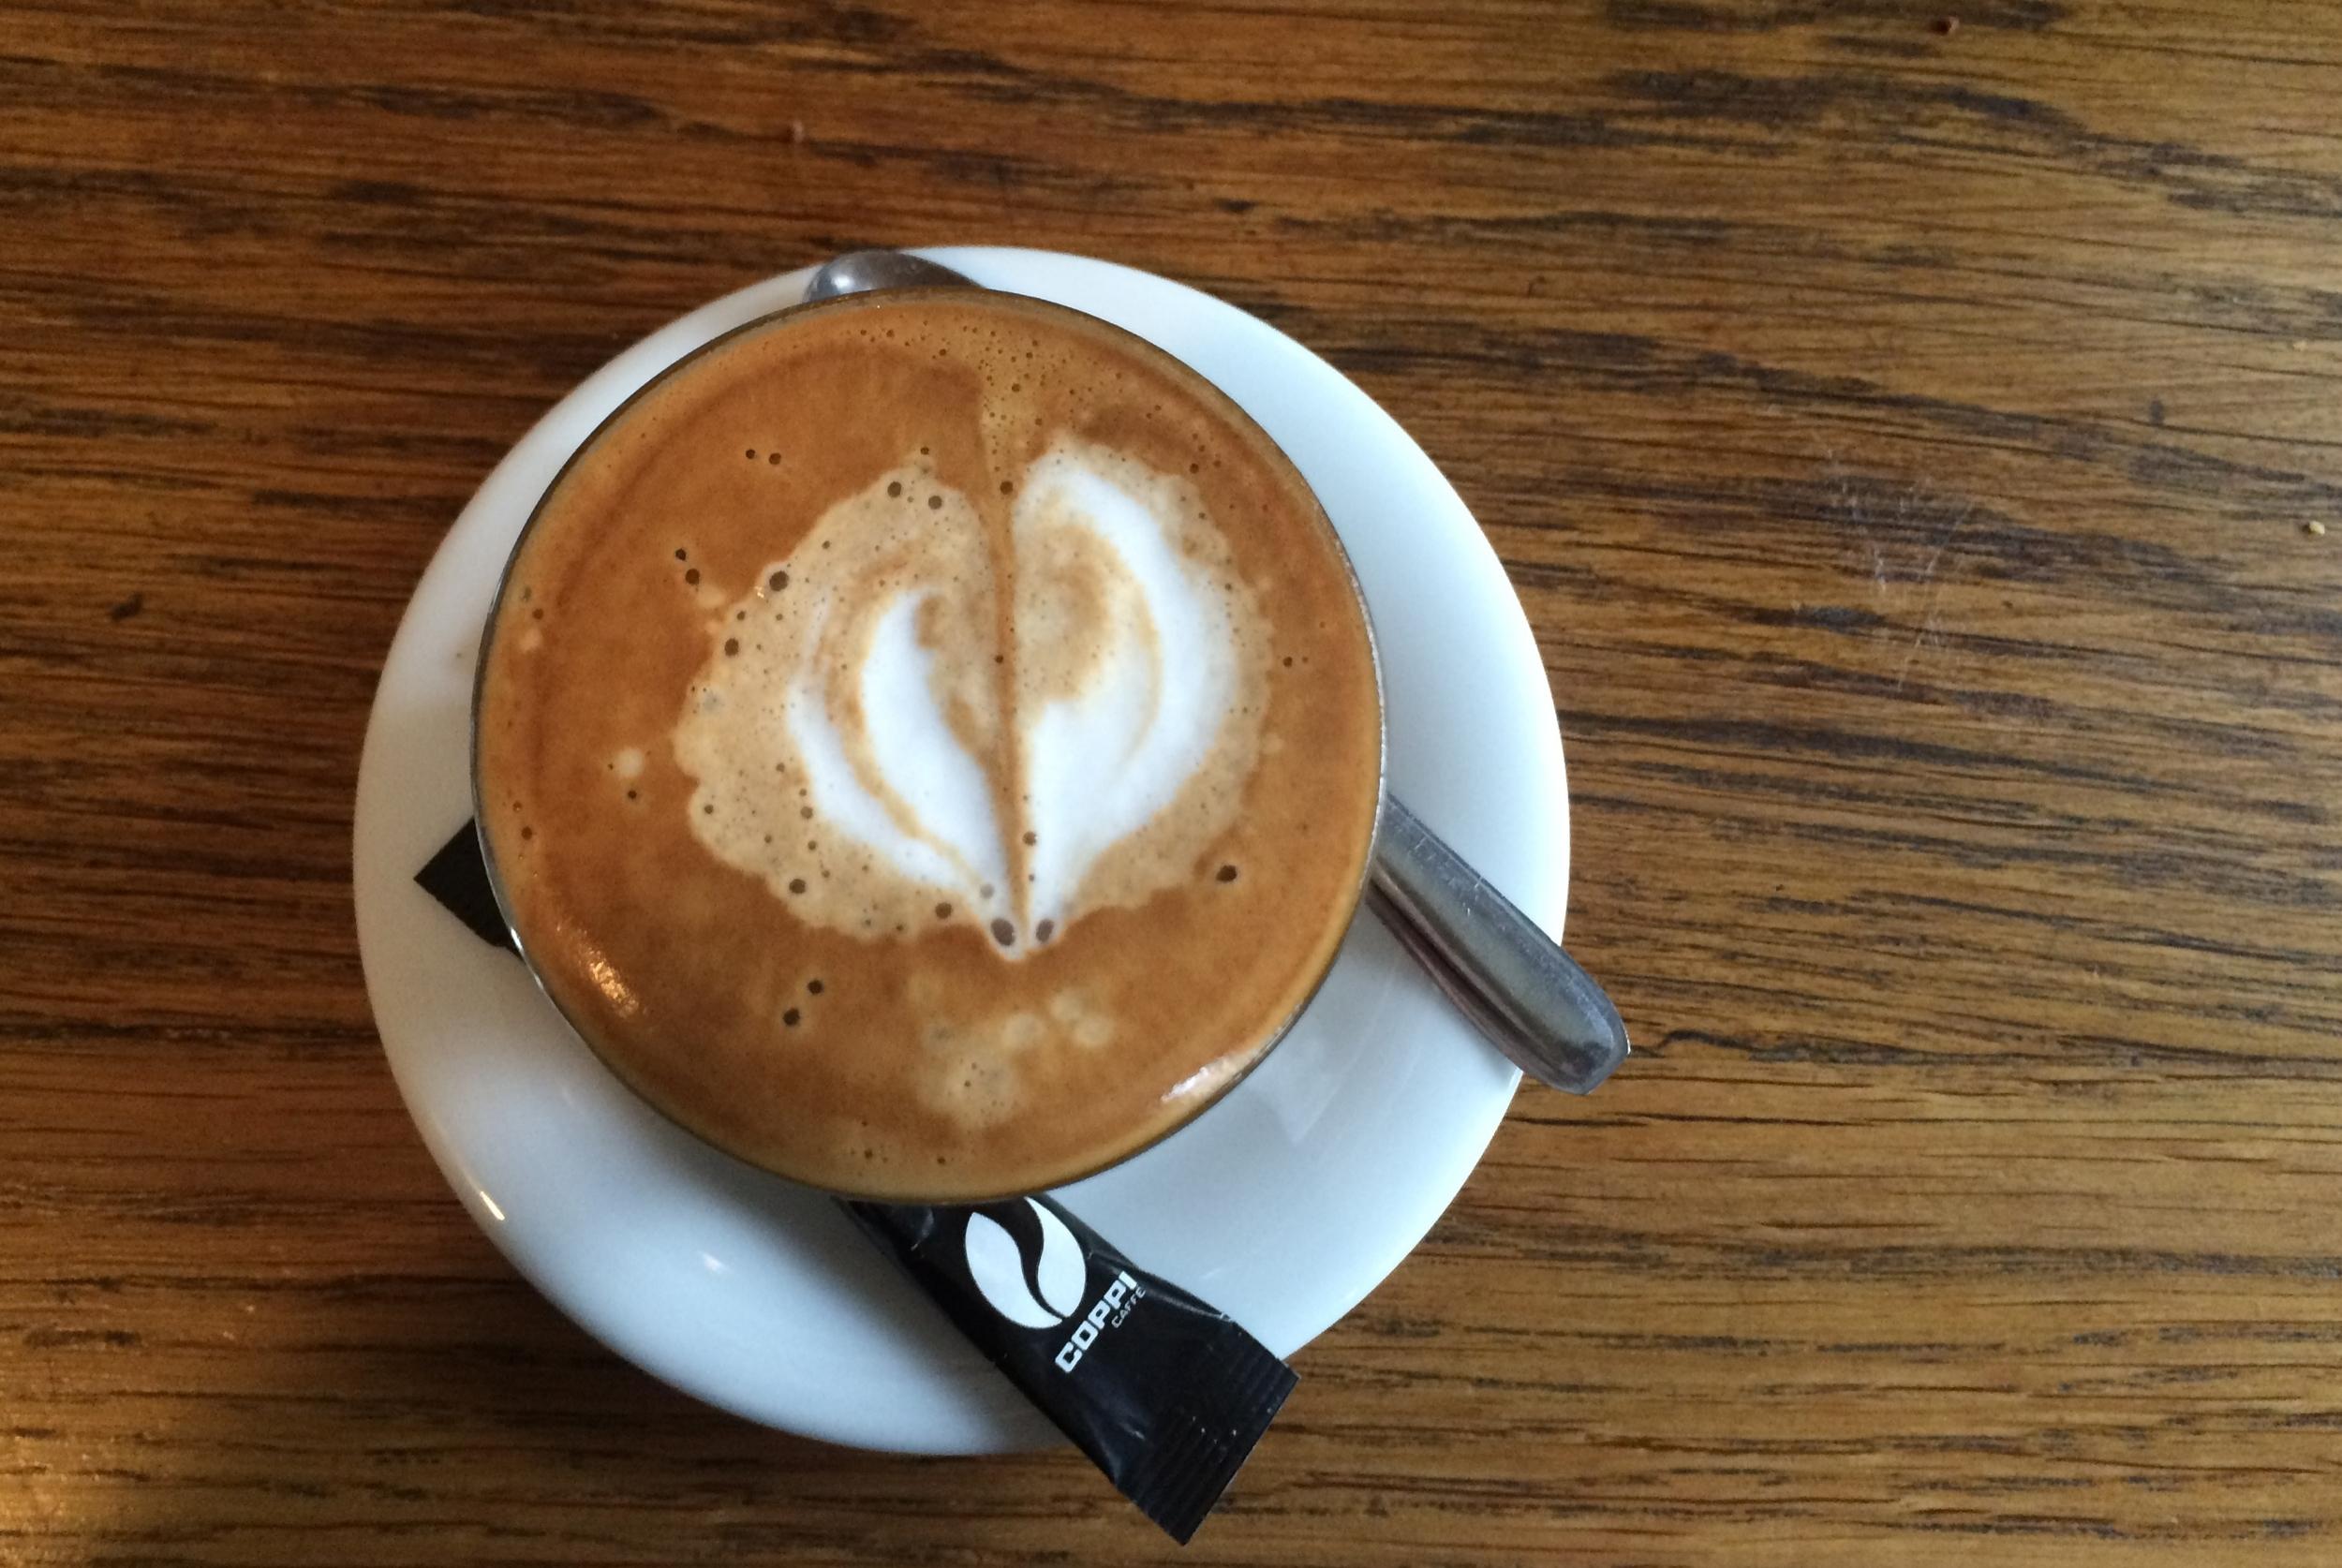 My café noisette at Yard Restaurant